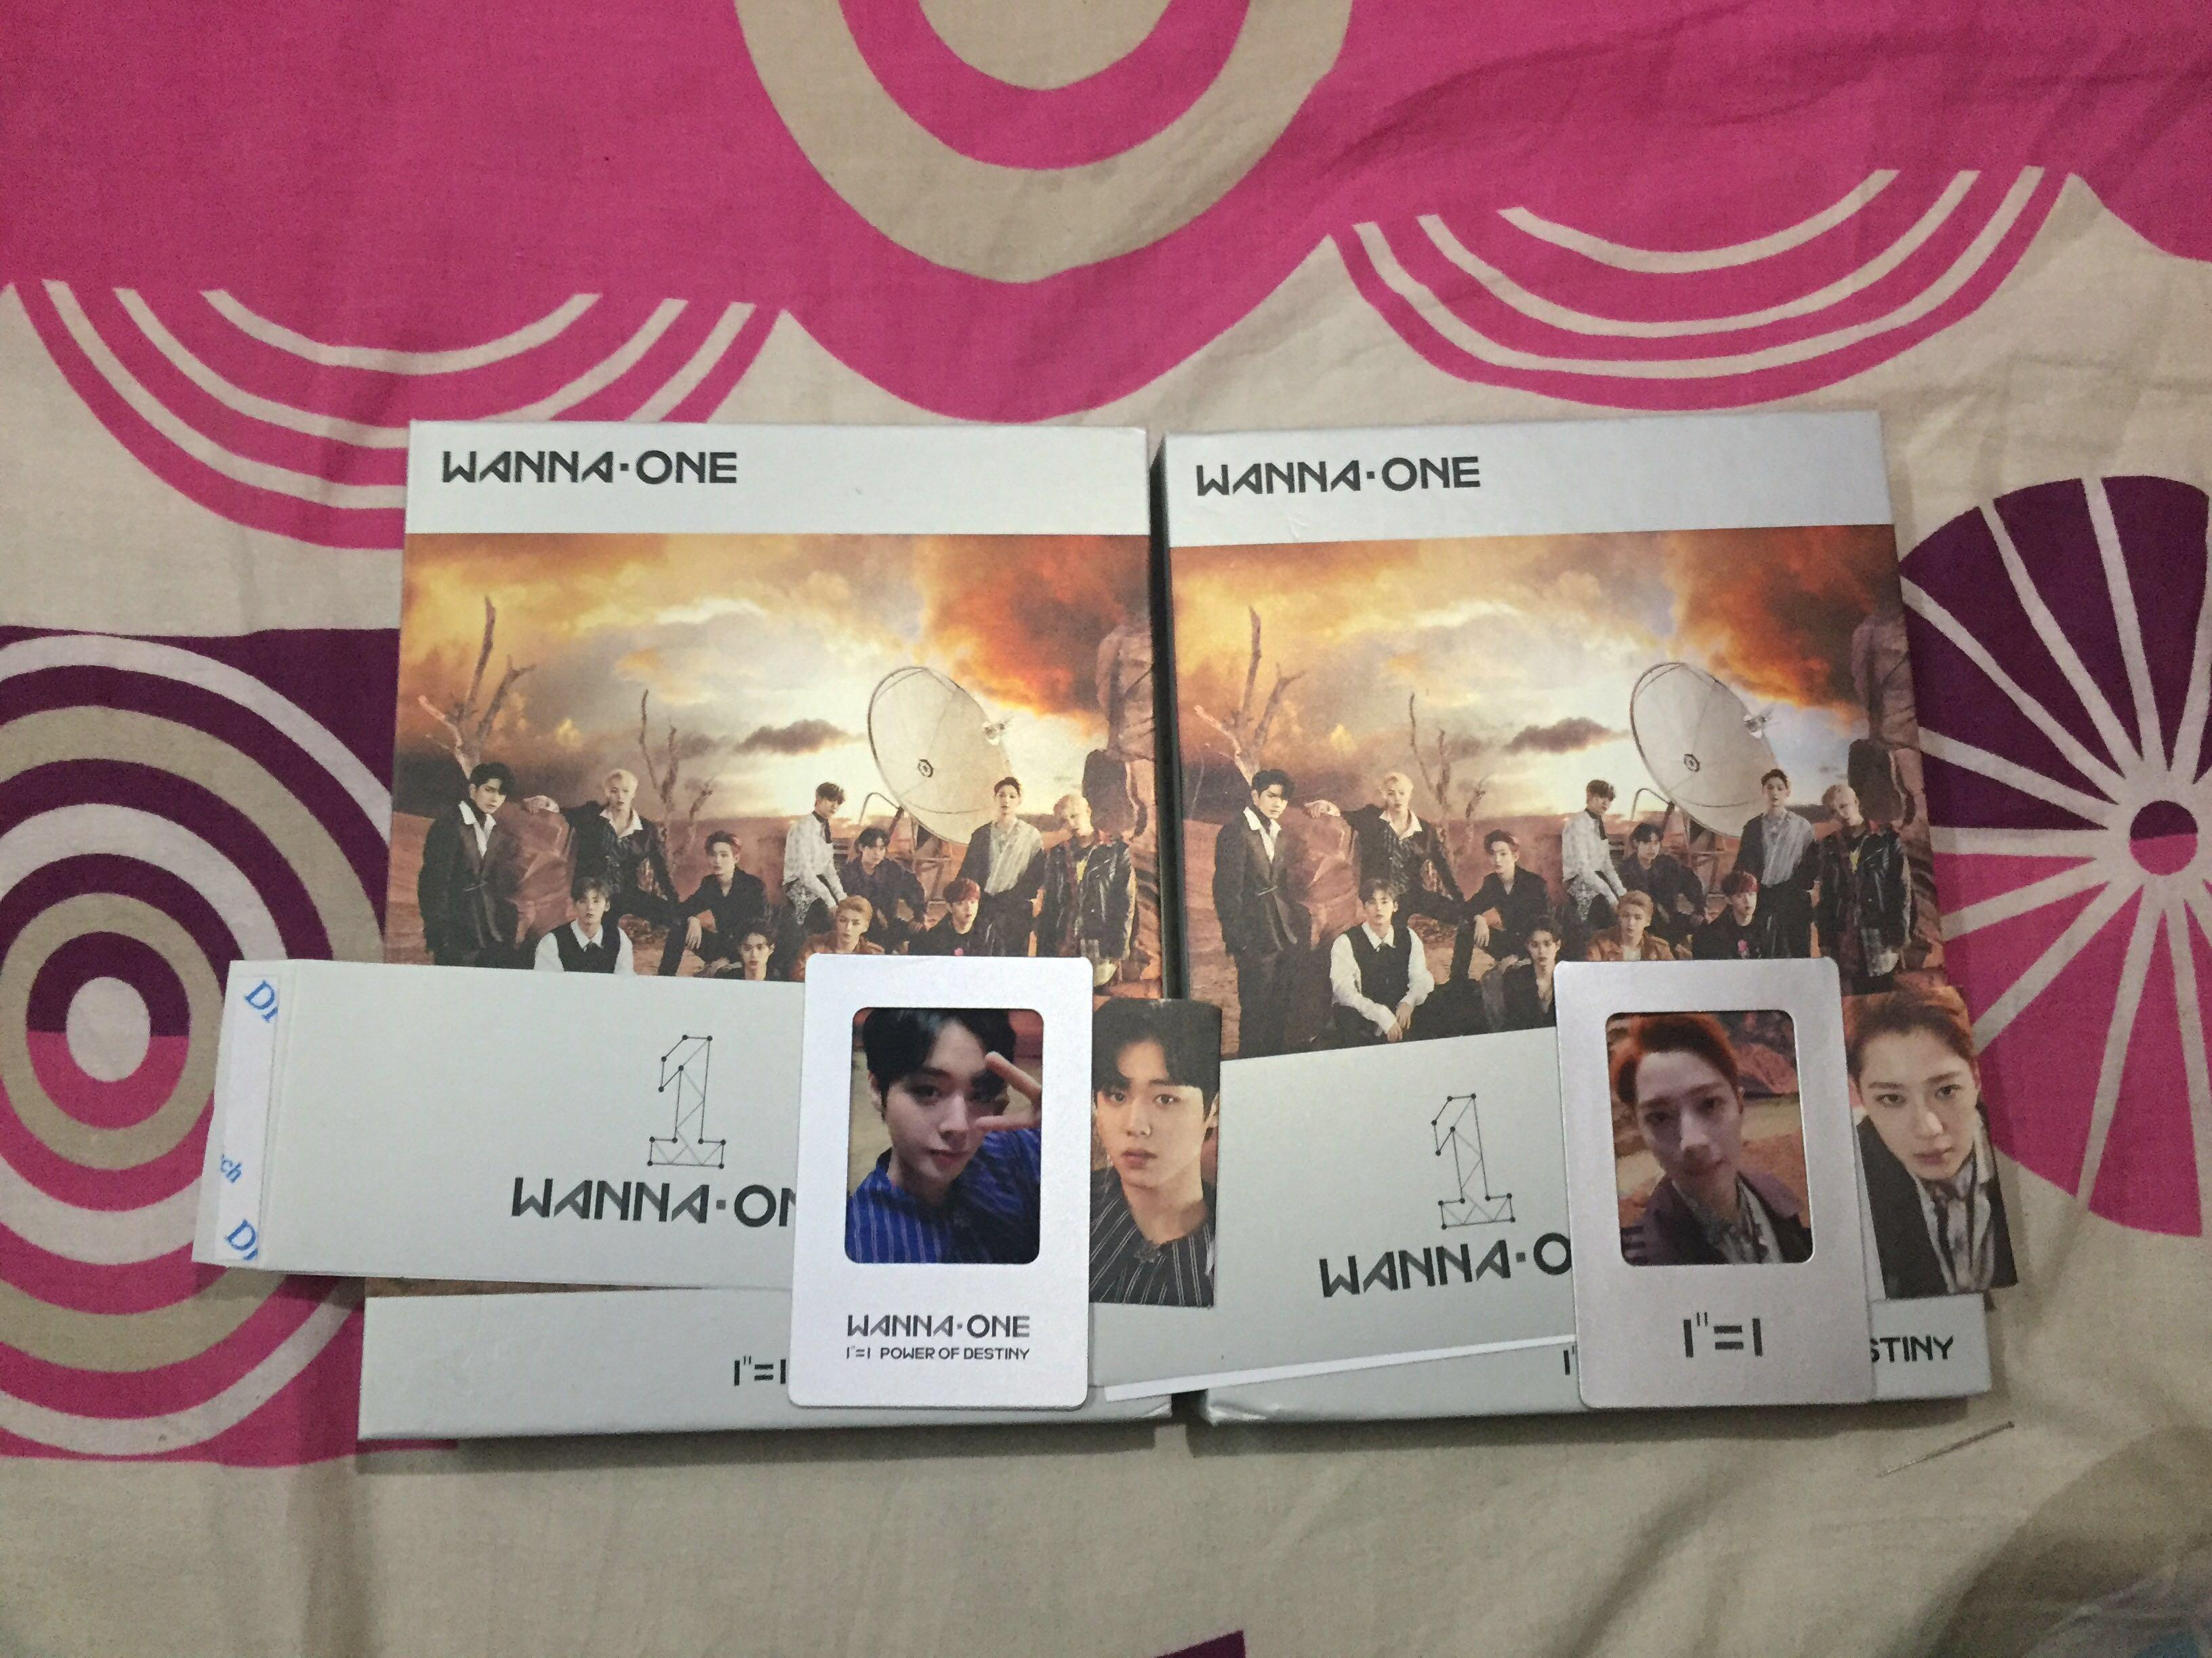 Wanna One Power Of Destiny Album Fullset Jihoon/Kuanlin